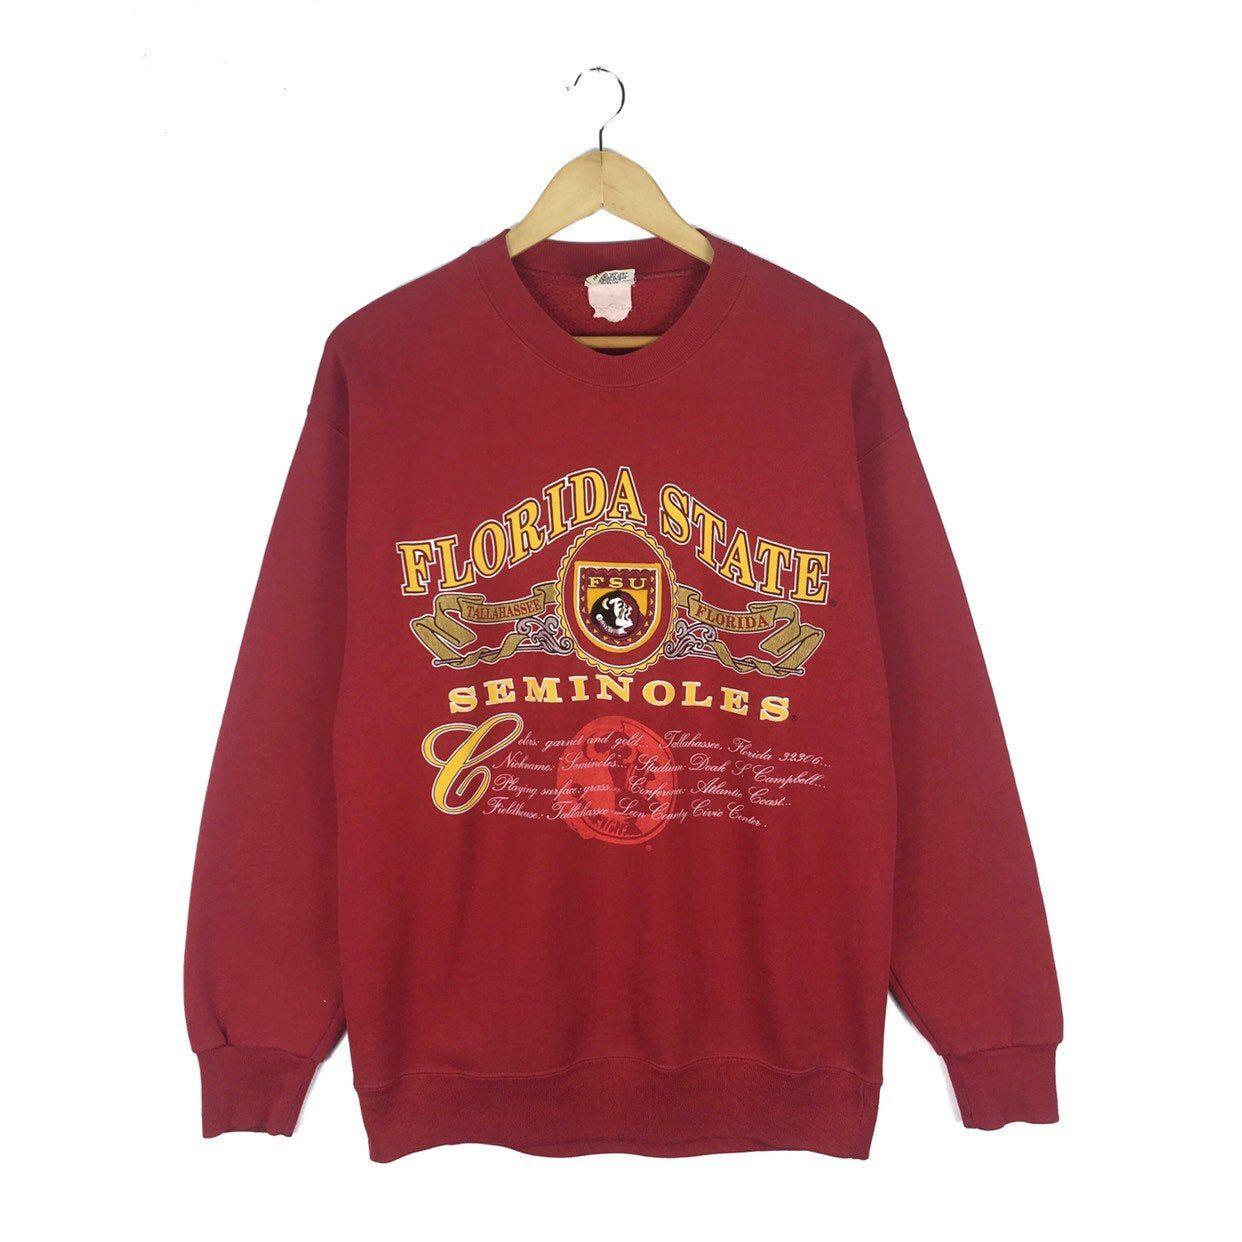 Vintage 90s Florida State University Seminoles Sweatshirt Etsy Sweatshirts Pullover Sweatshirts Pullover [ 1242 x 1242 Pixel ]